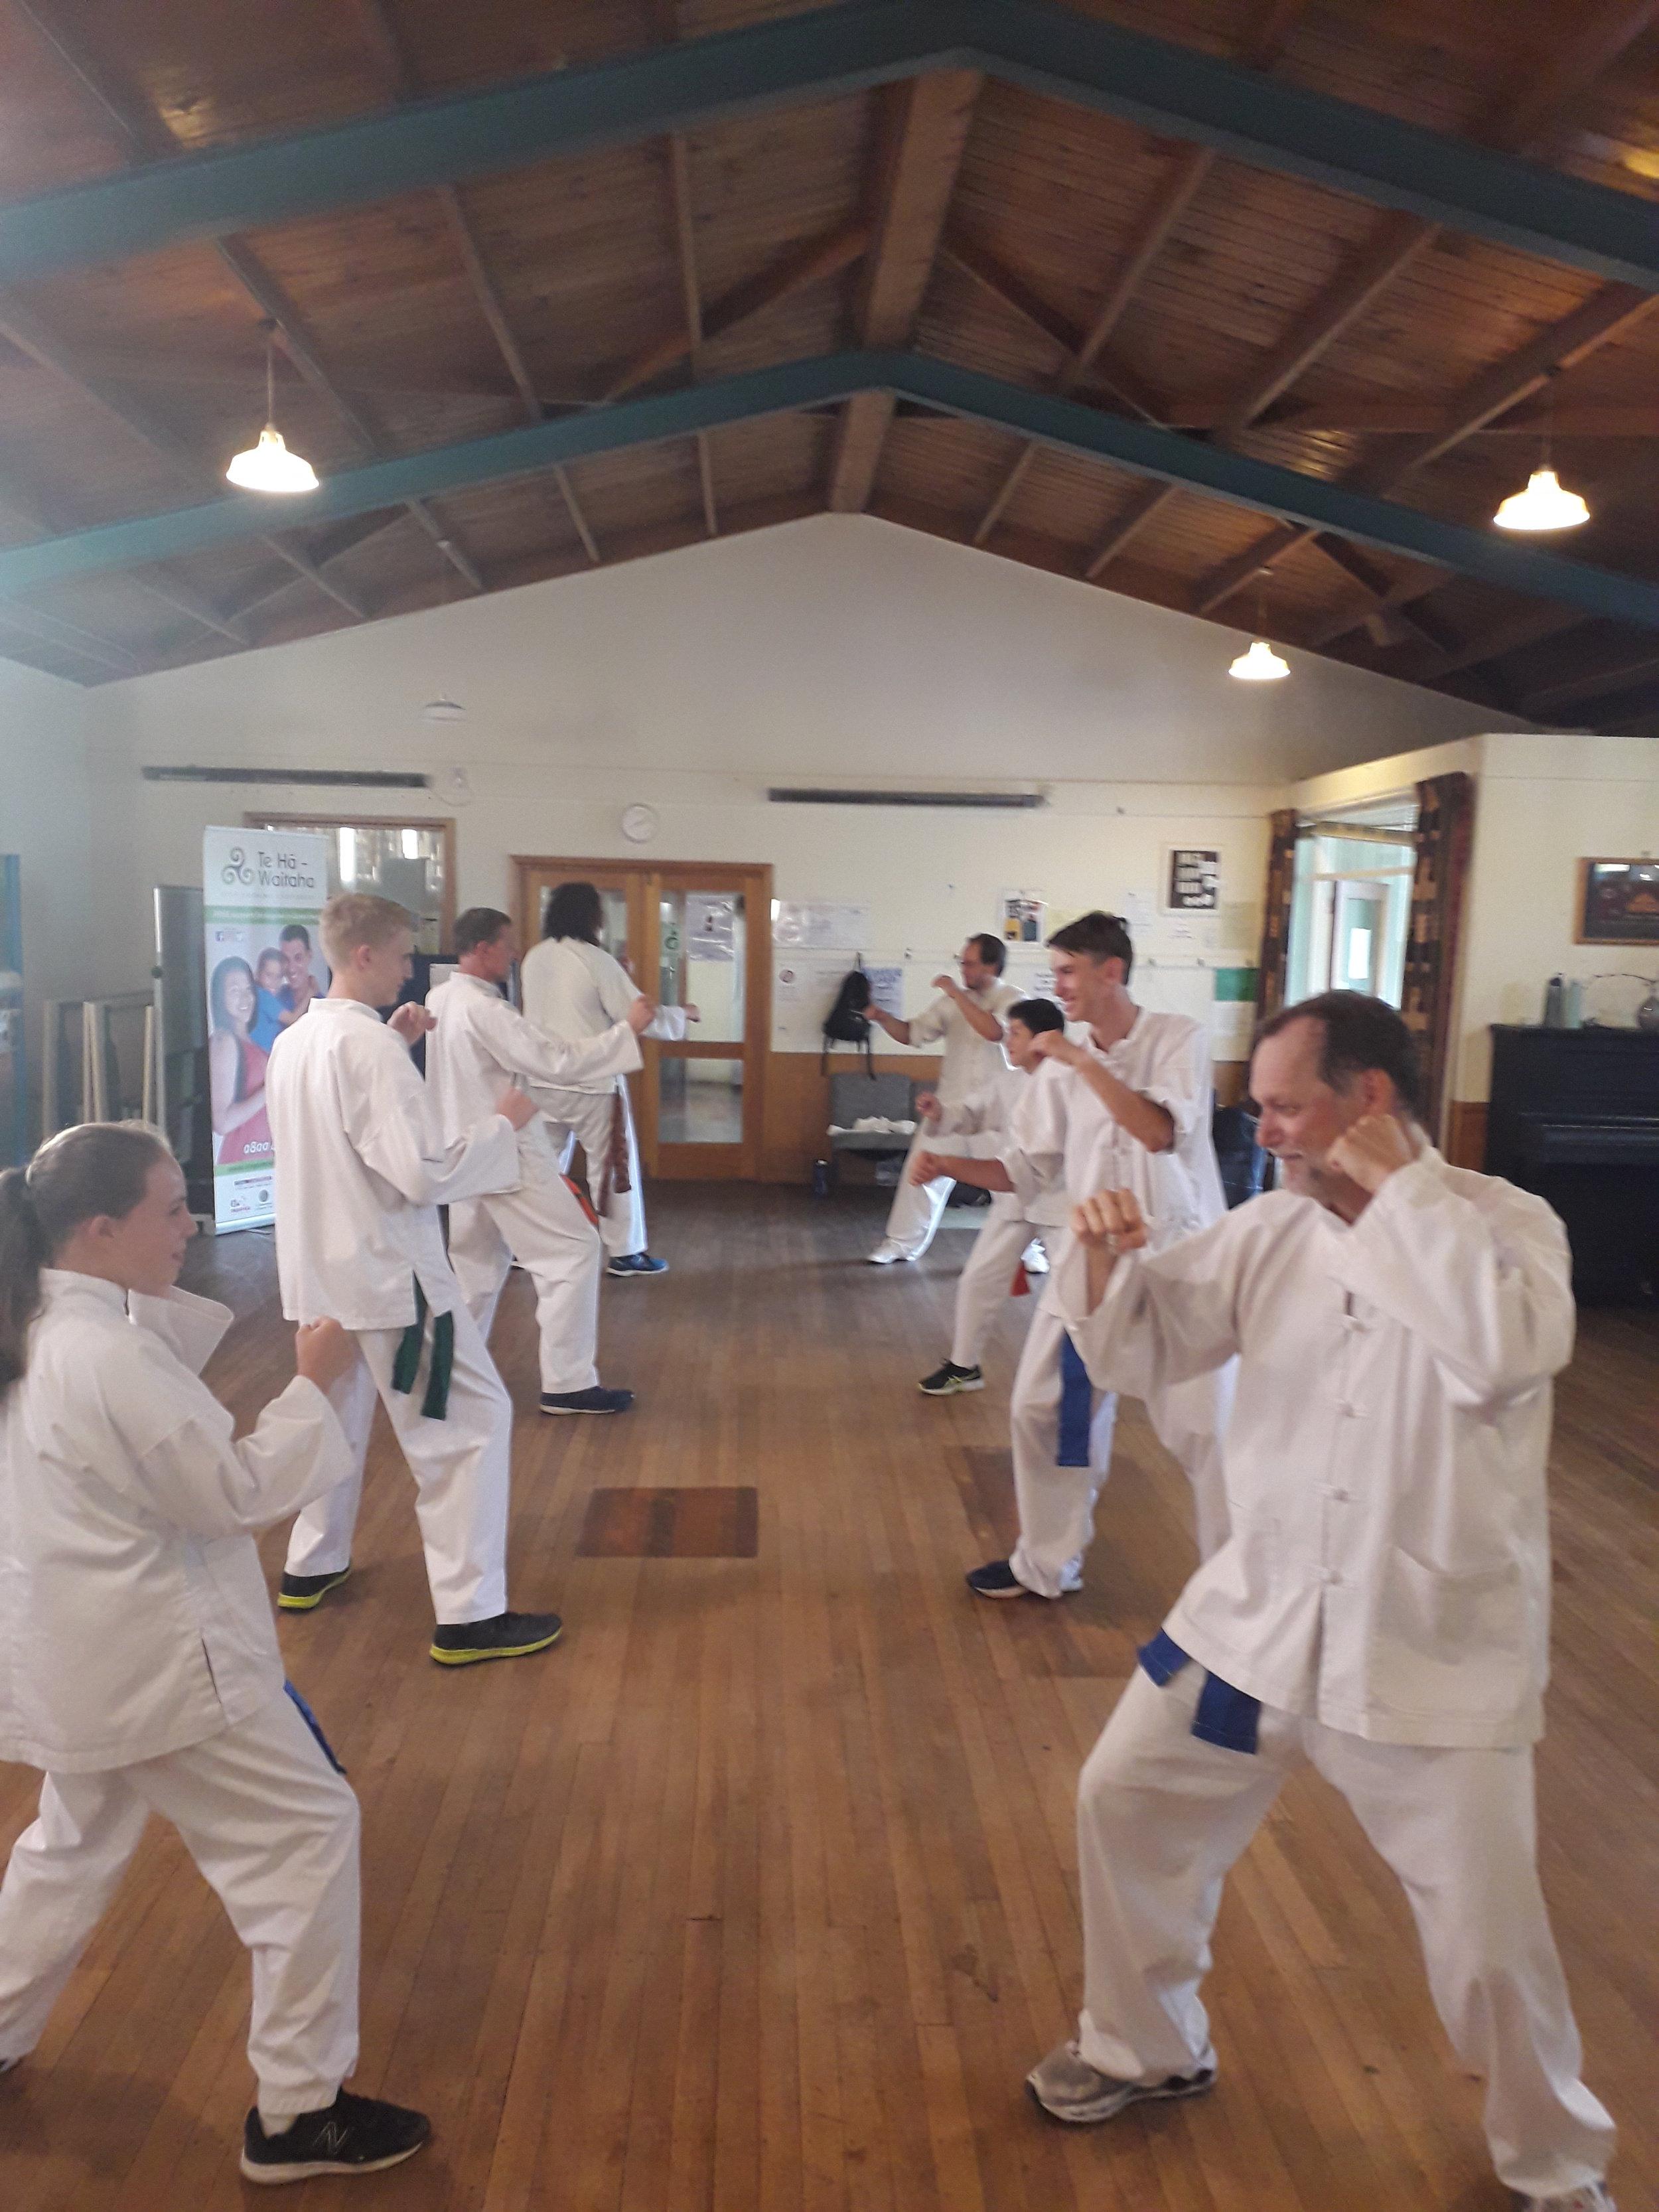 kung fu - Hornby 005.jpg